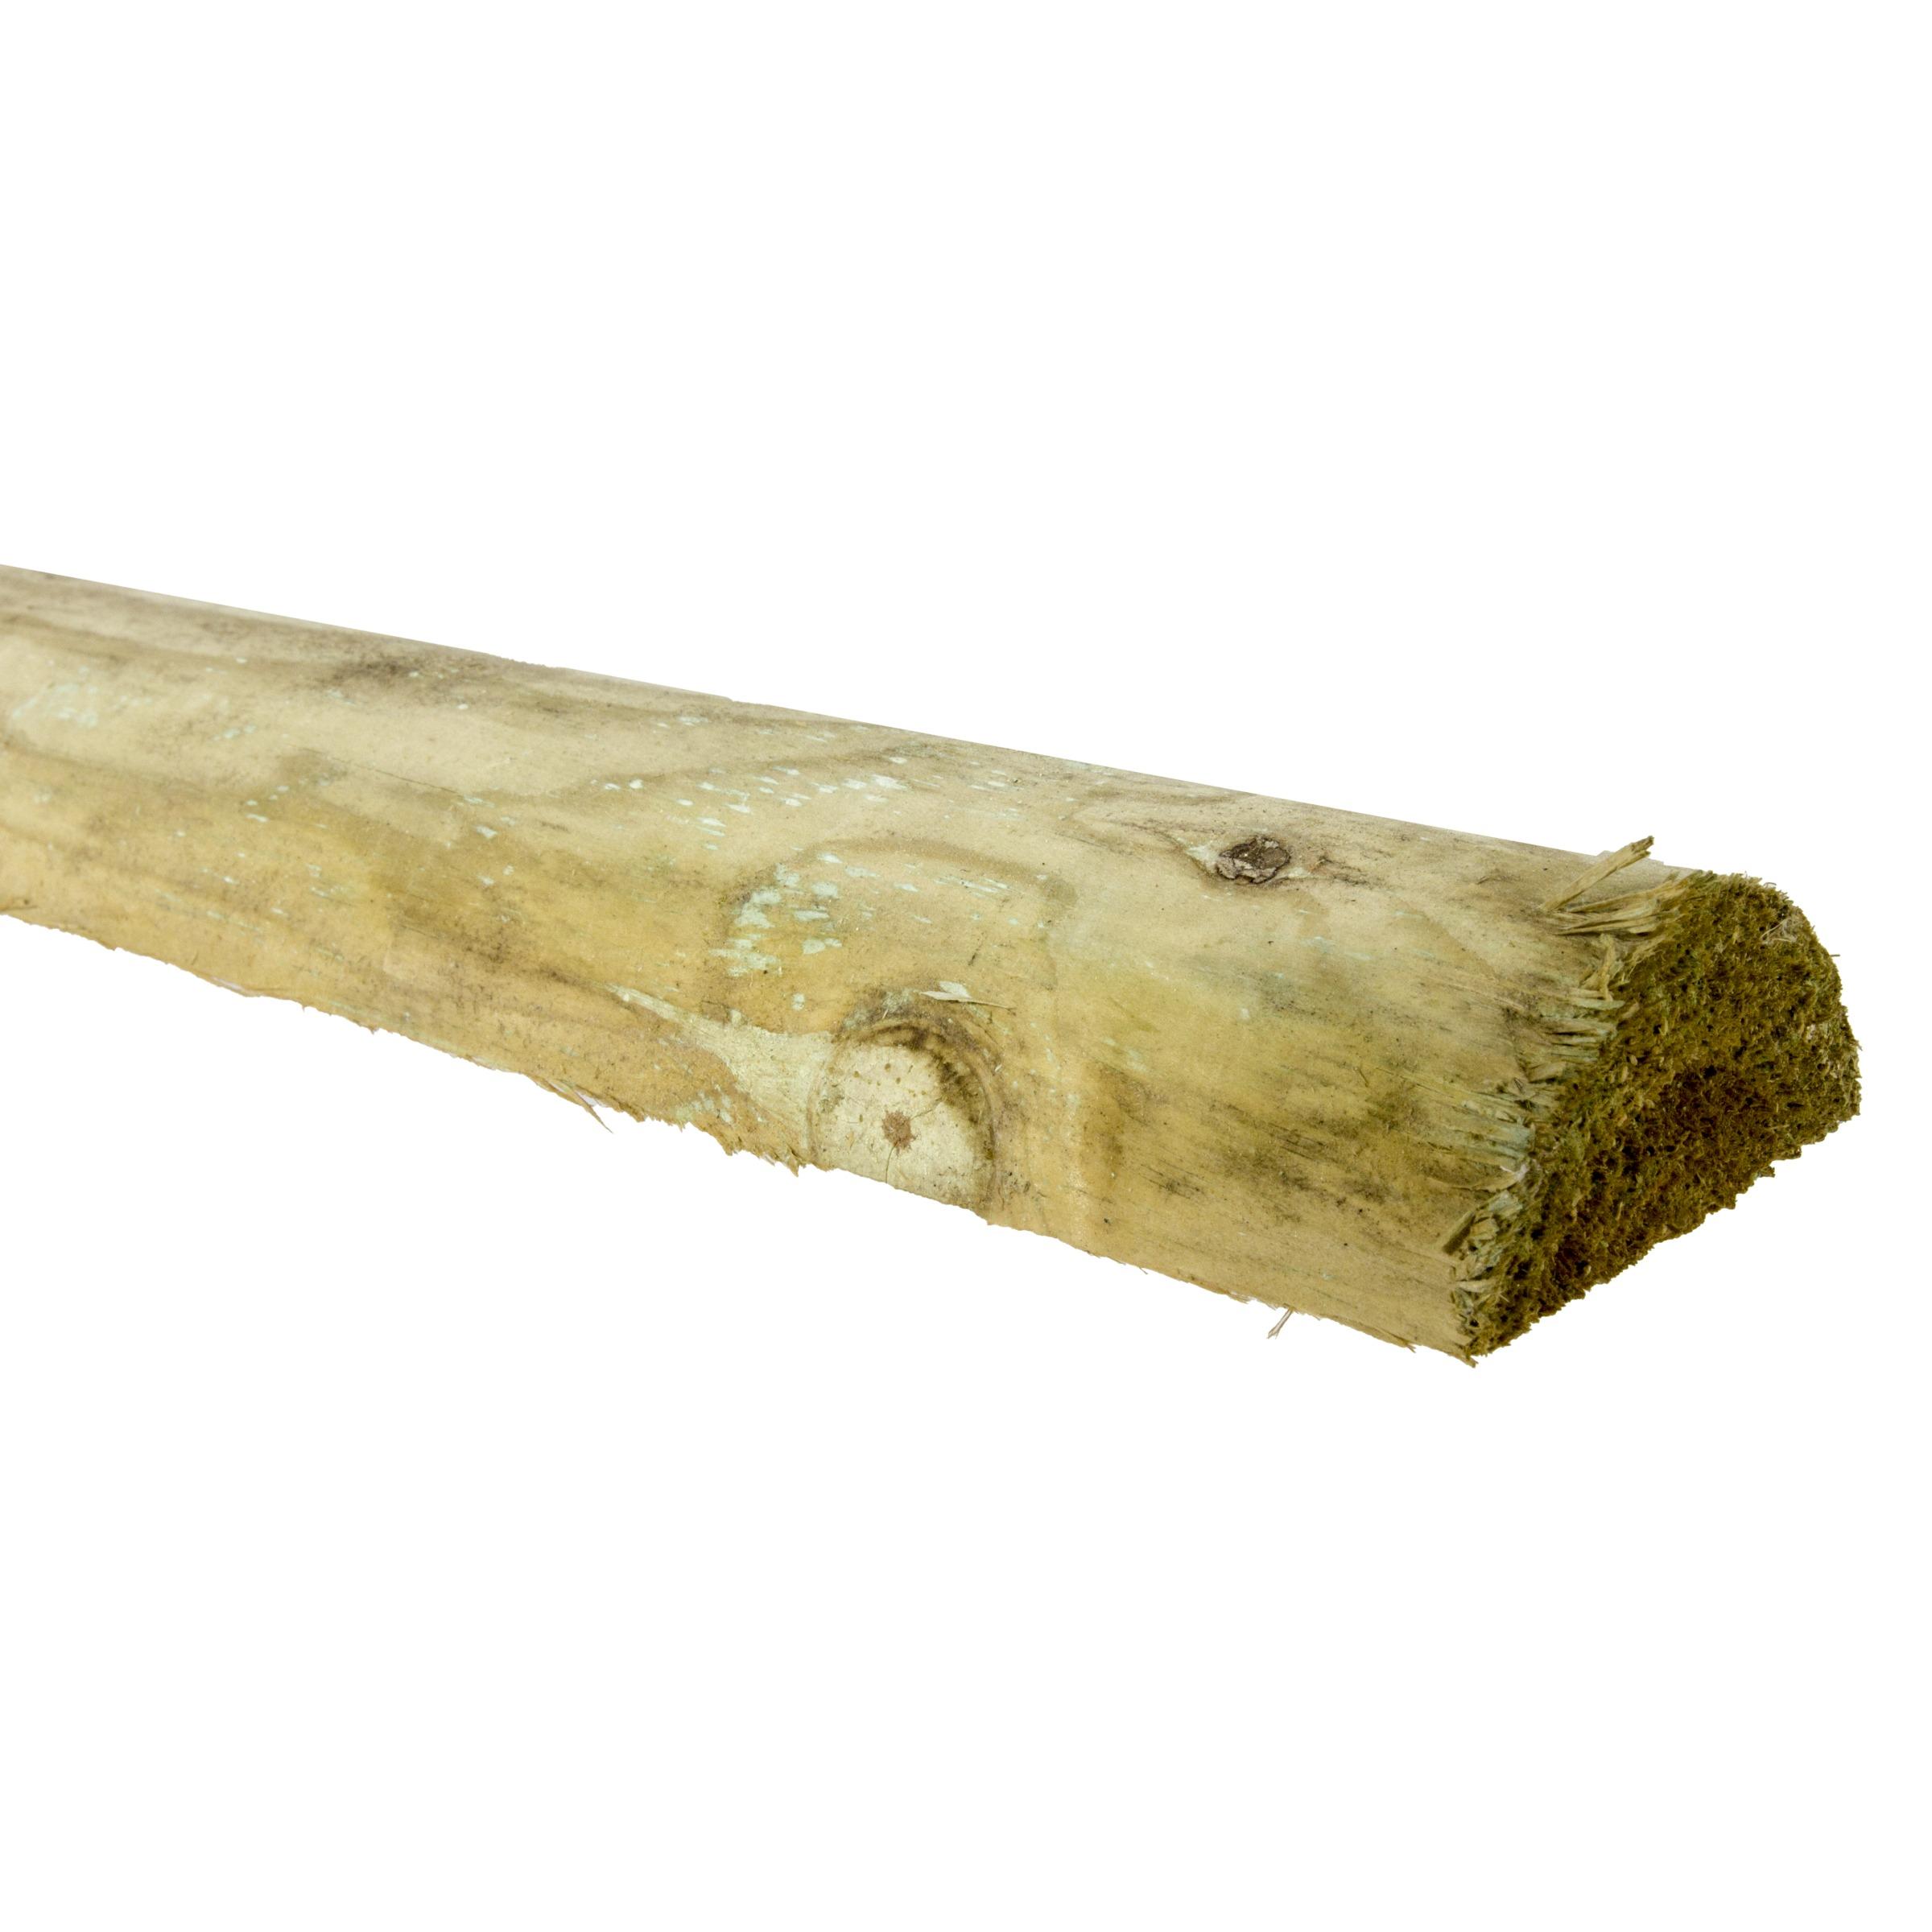 Tuinbalk regel halfrond zachthout 250x7x3,5 cm